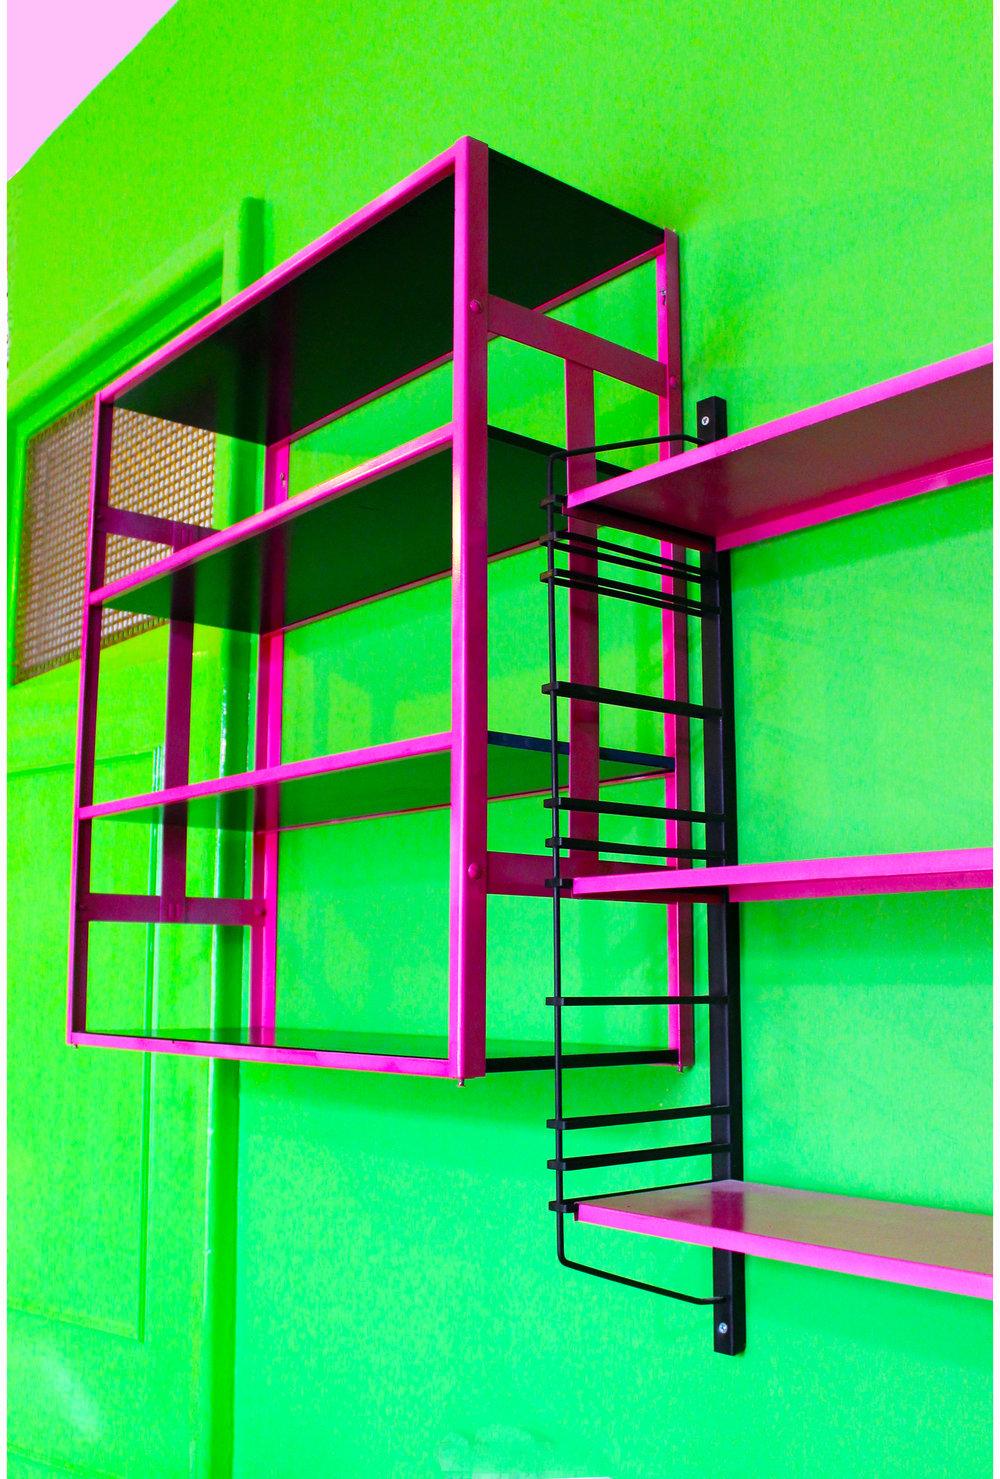 Kitchen Shelves Side Angle w border.jpg